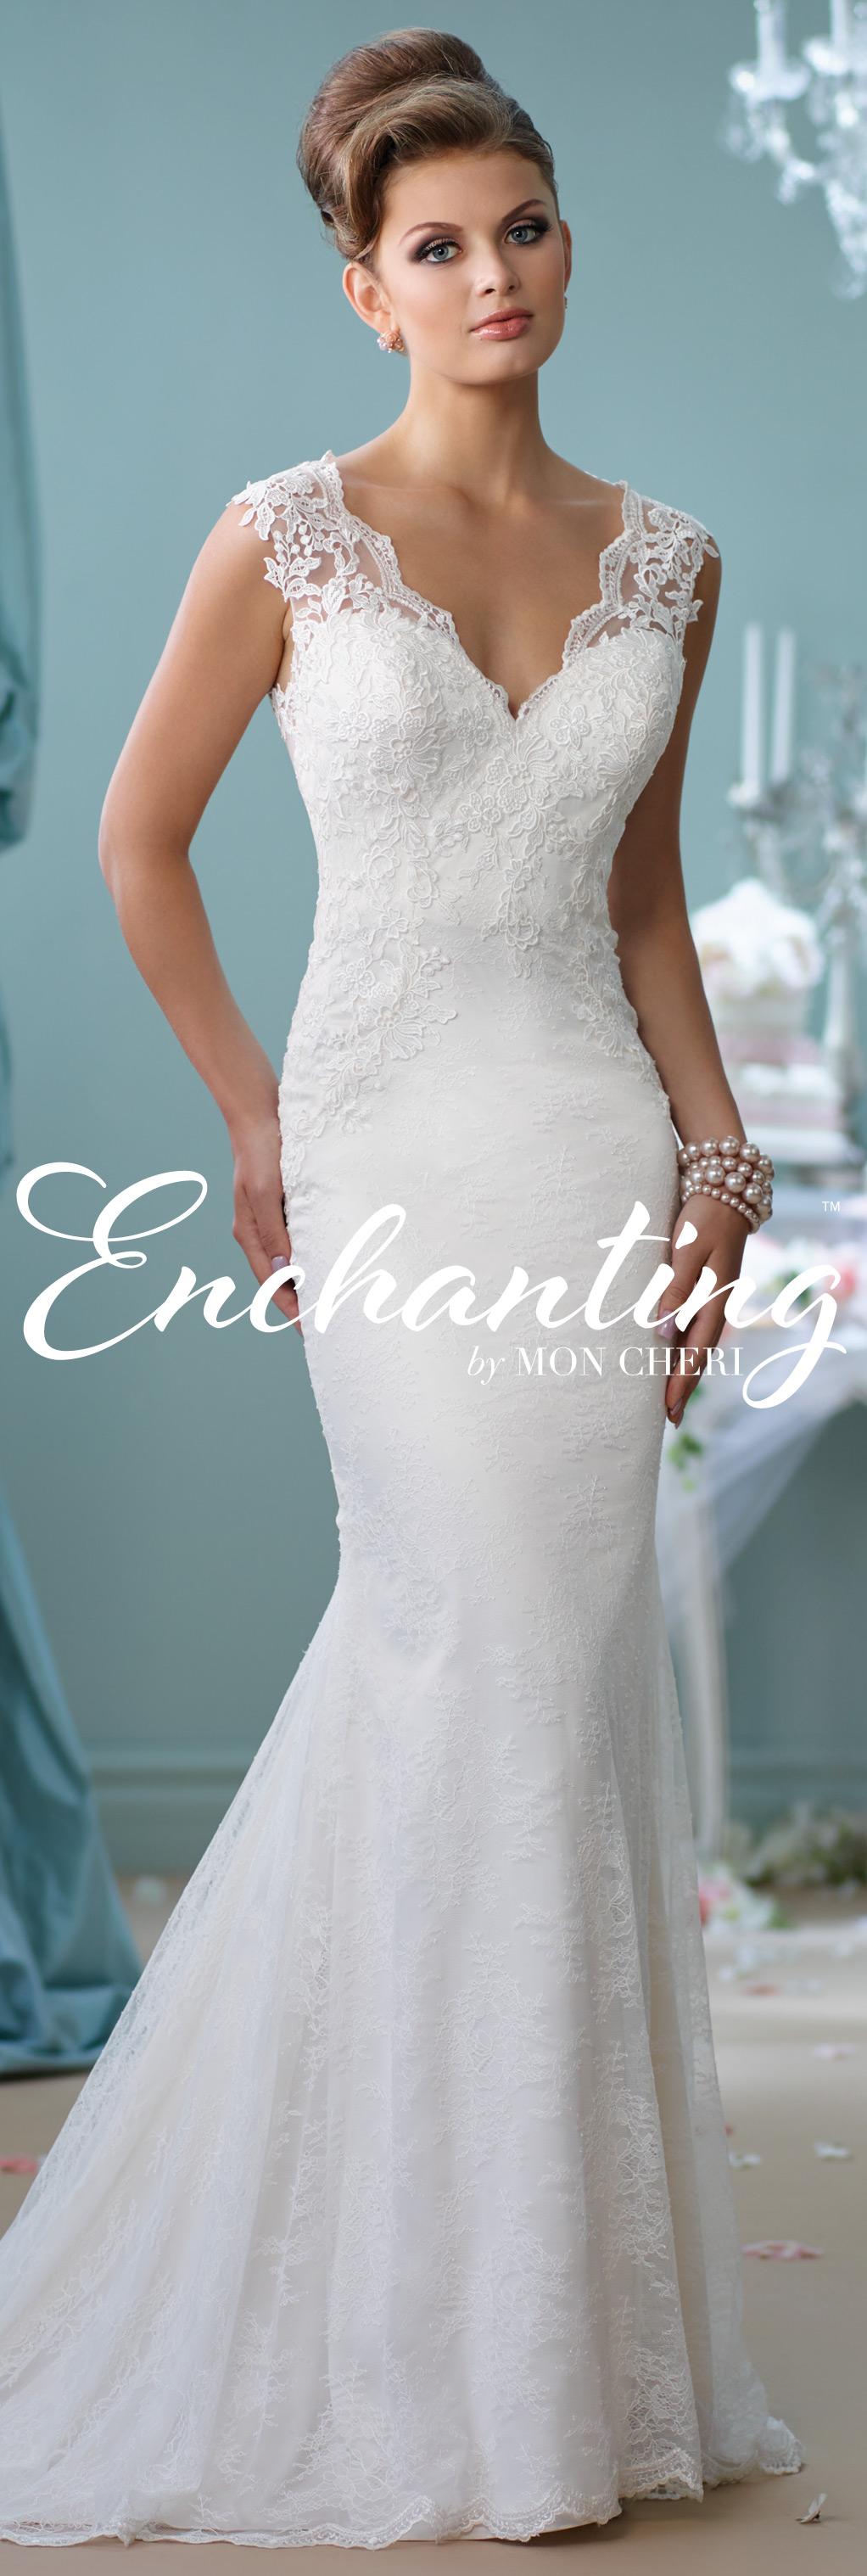 Modern wedding dresses by mon cheri in wedding dresses